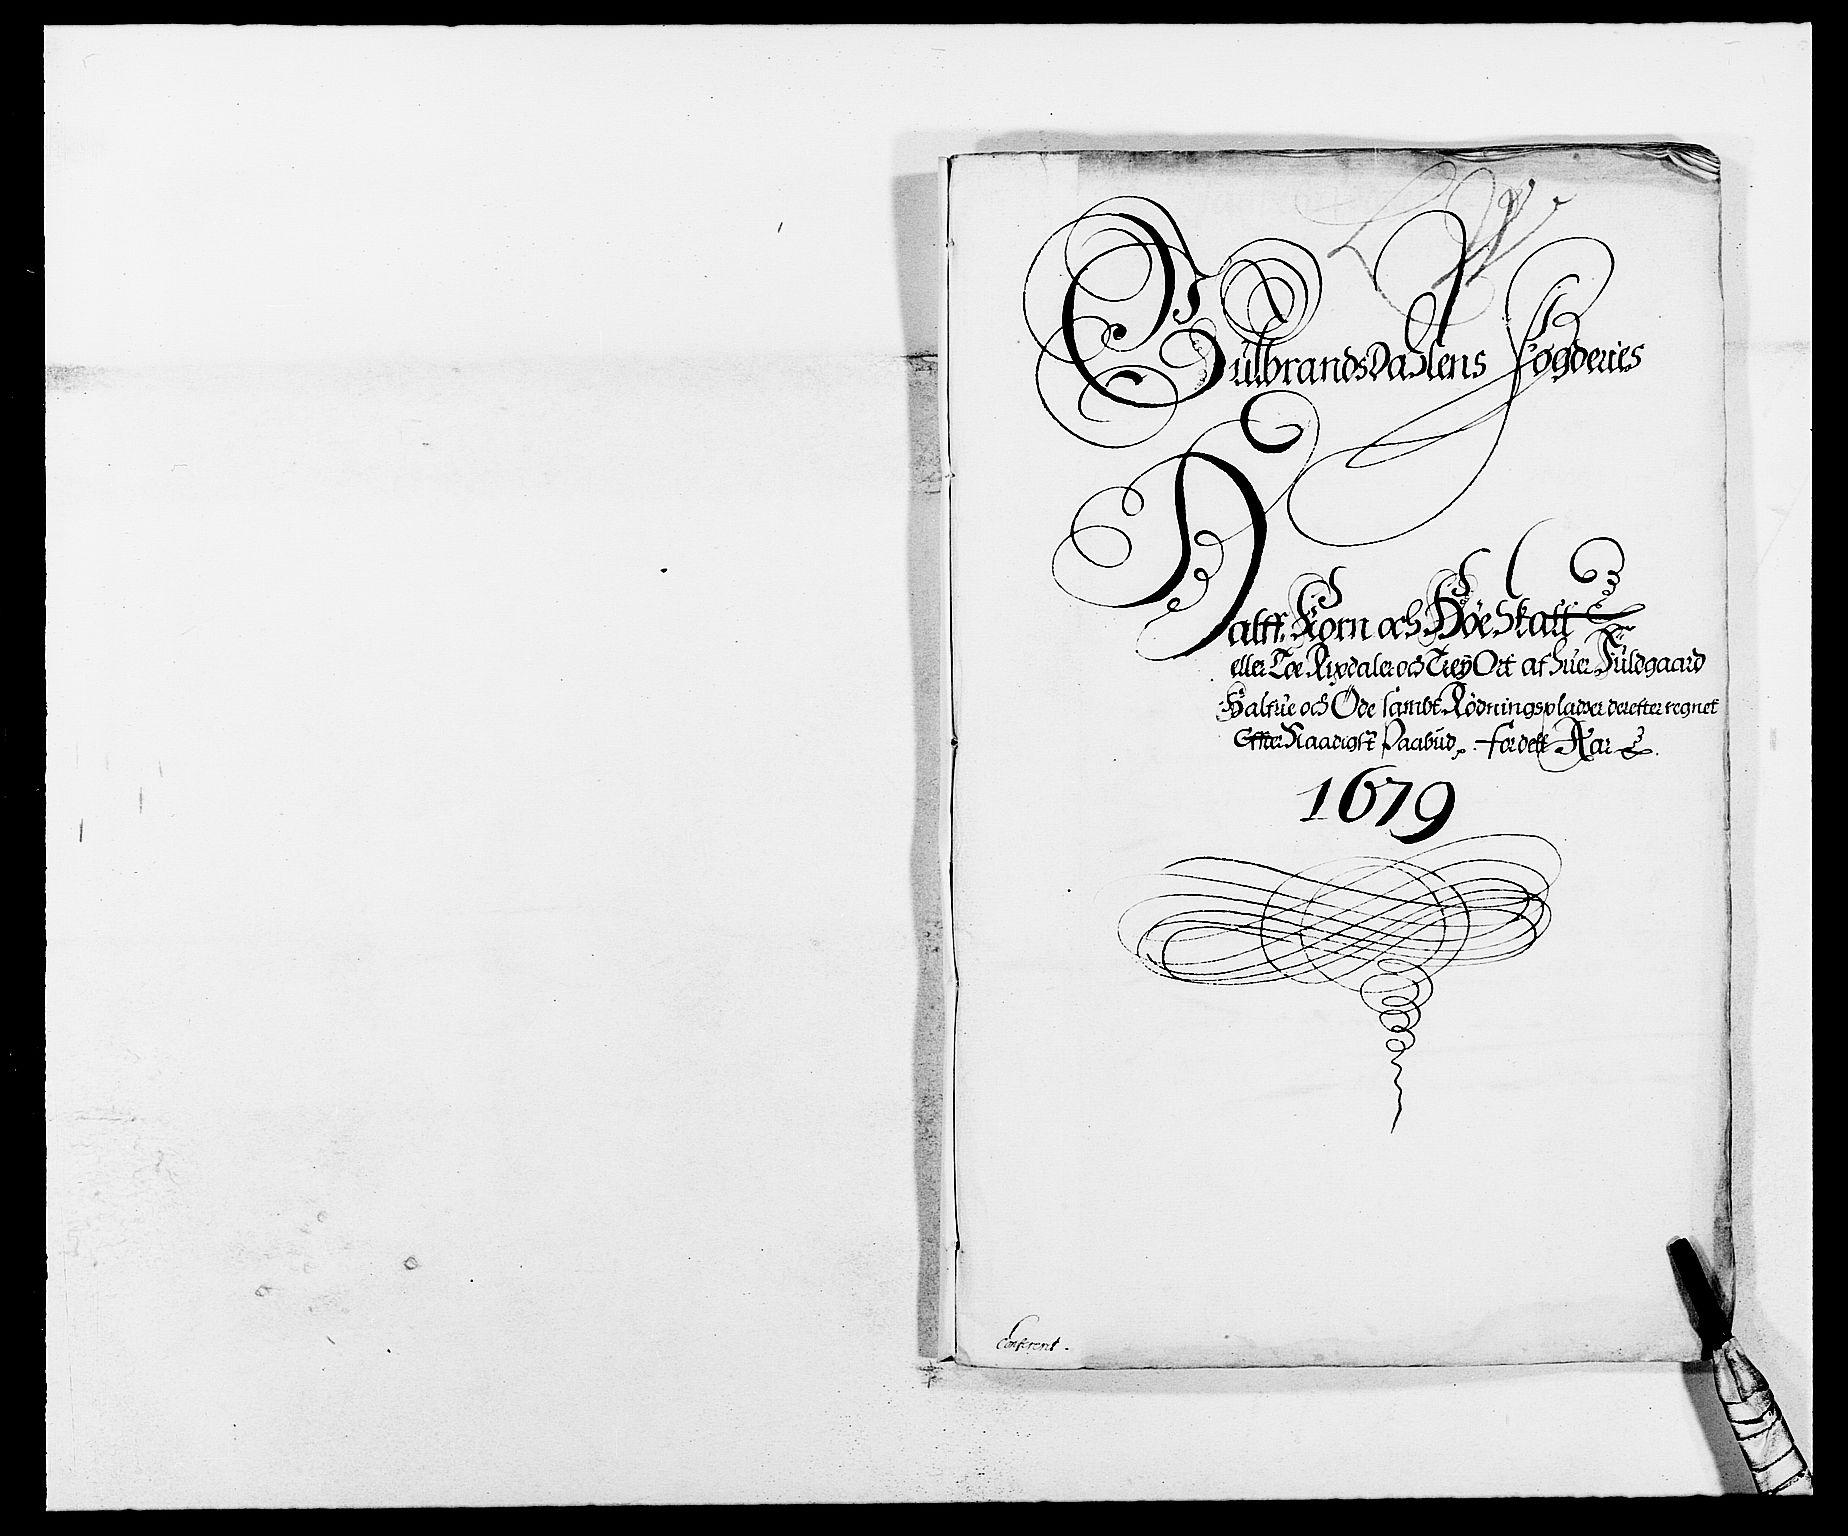 RA, Rentekammeret inntil 1814, Reviderte regnskaper, Fogderegnskap, R17/L1153: Fogderegnskap Gudbrandsdal, 1678-1679, s. 307